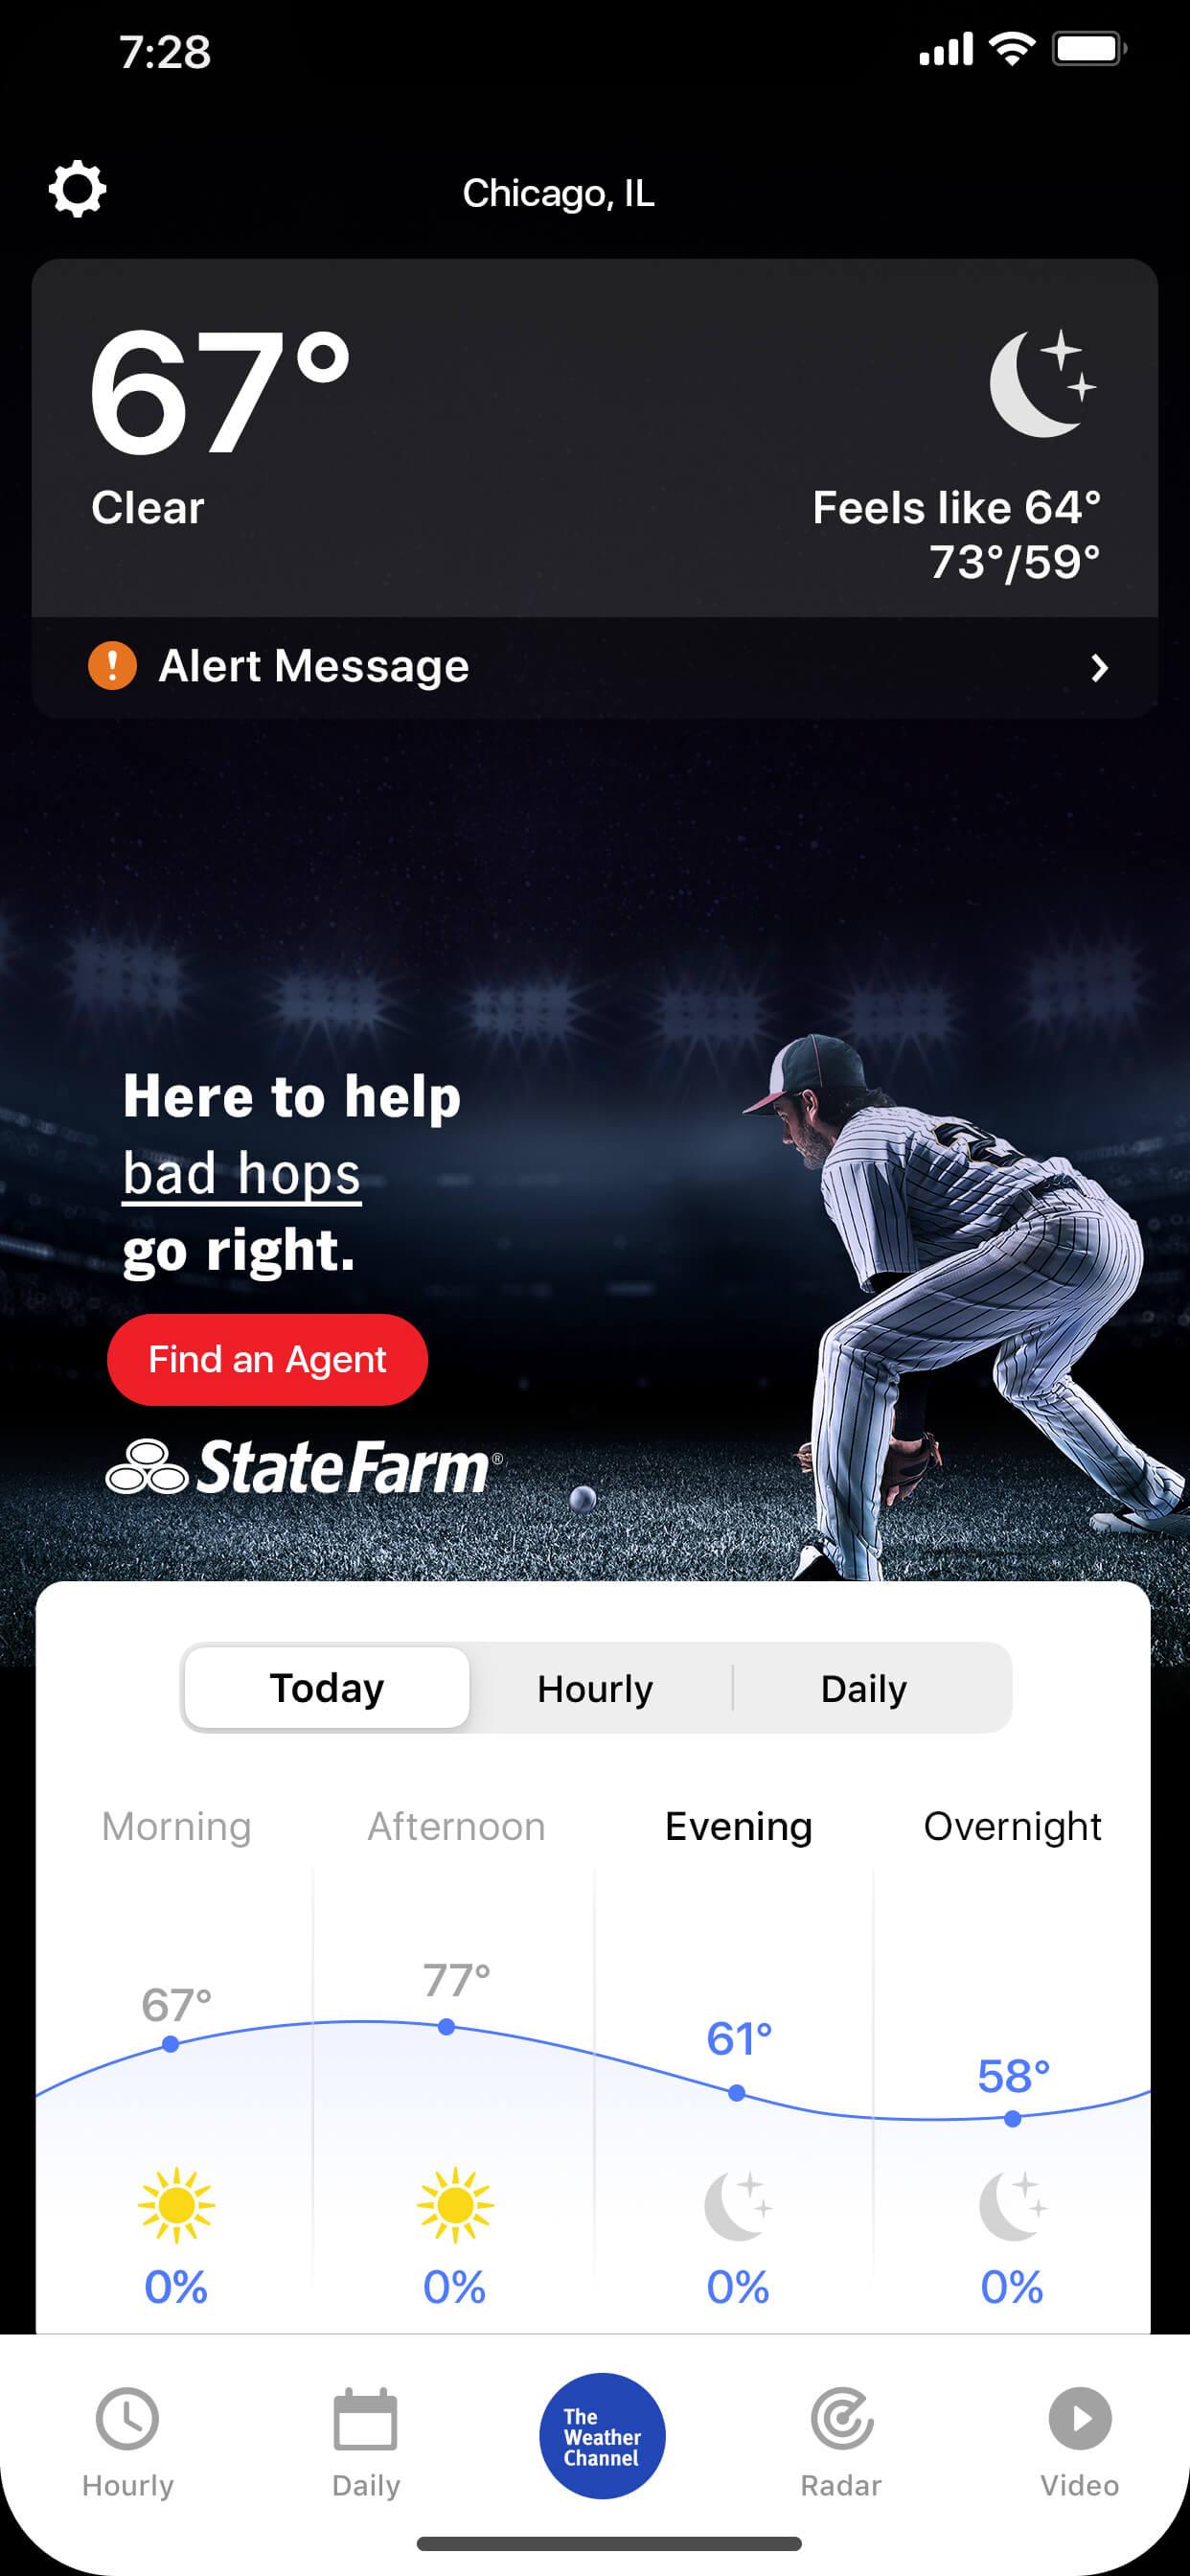 StateFarmMLB_Mobile_App-IM_NextGen-CubsMock___clear_night